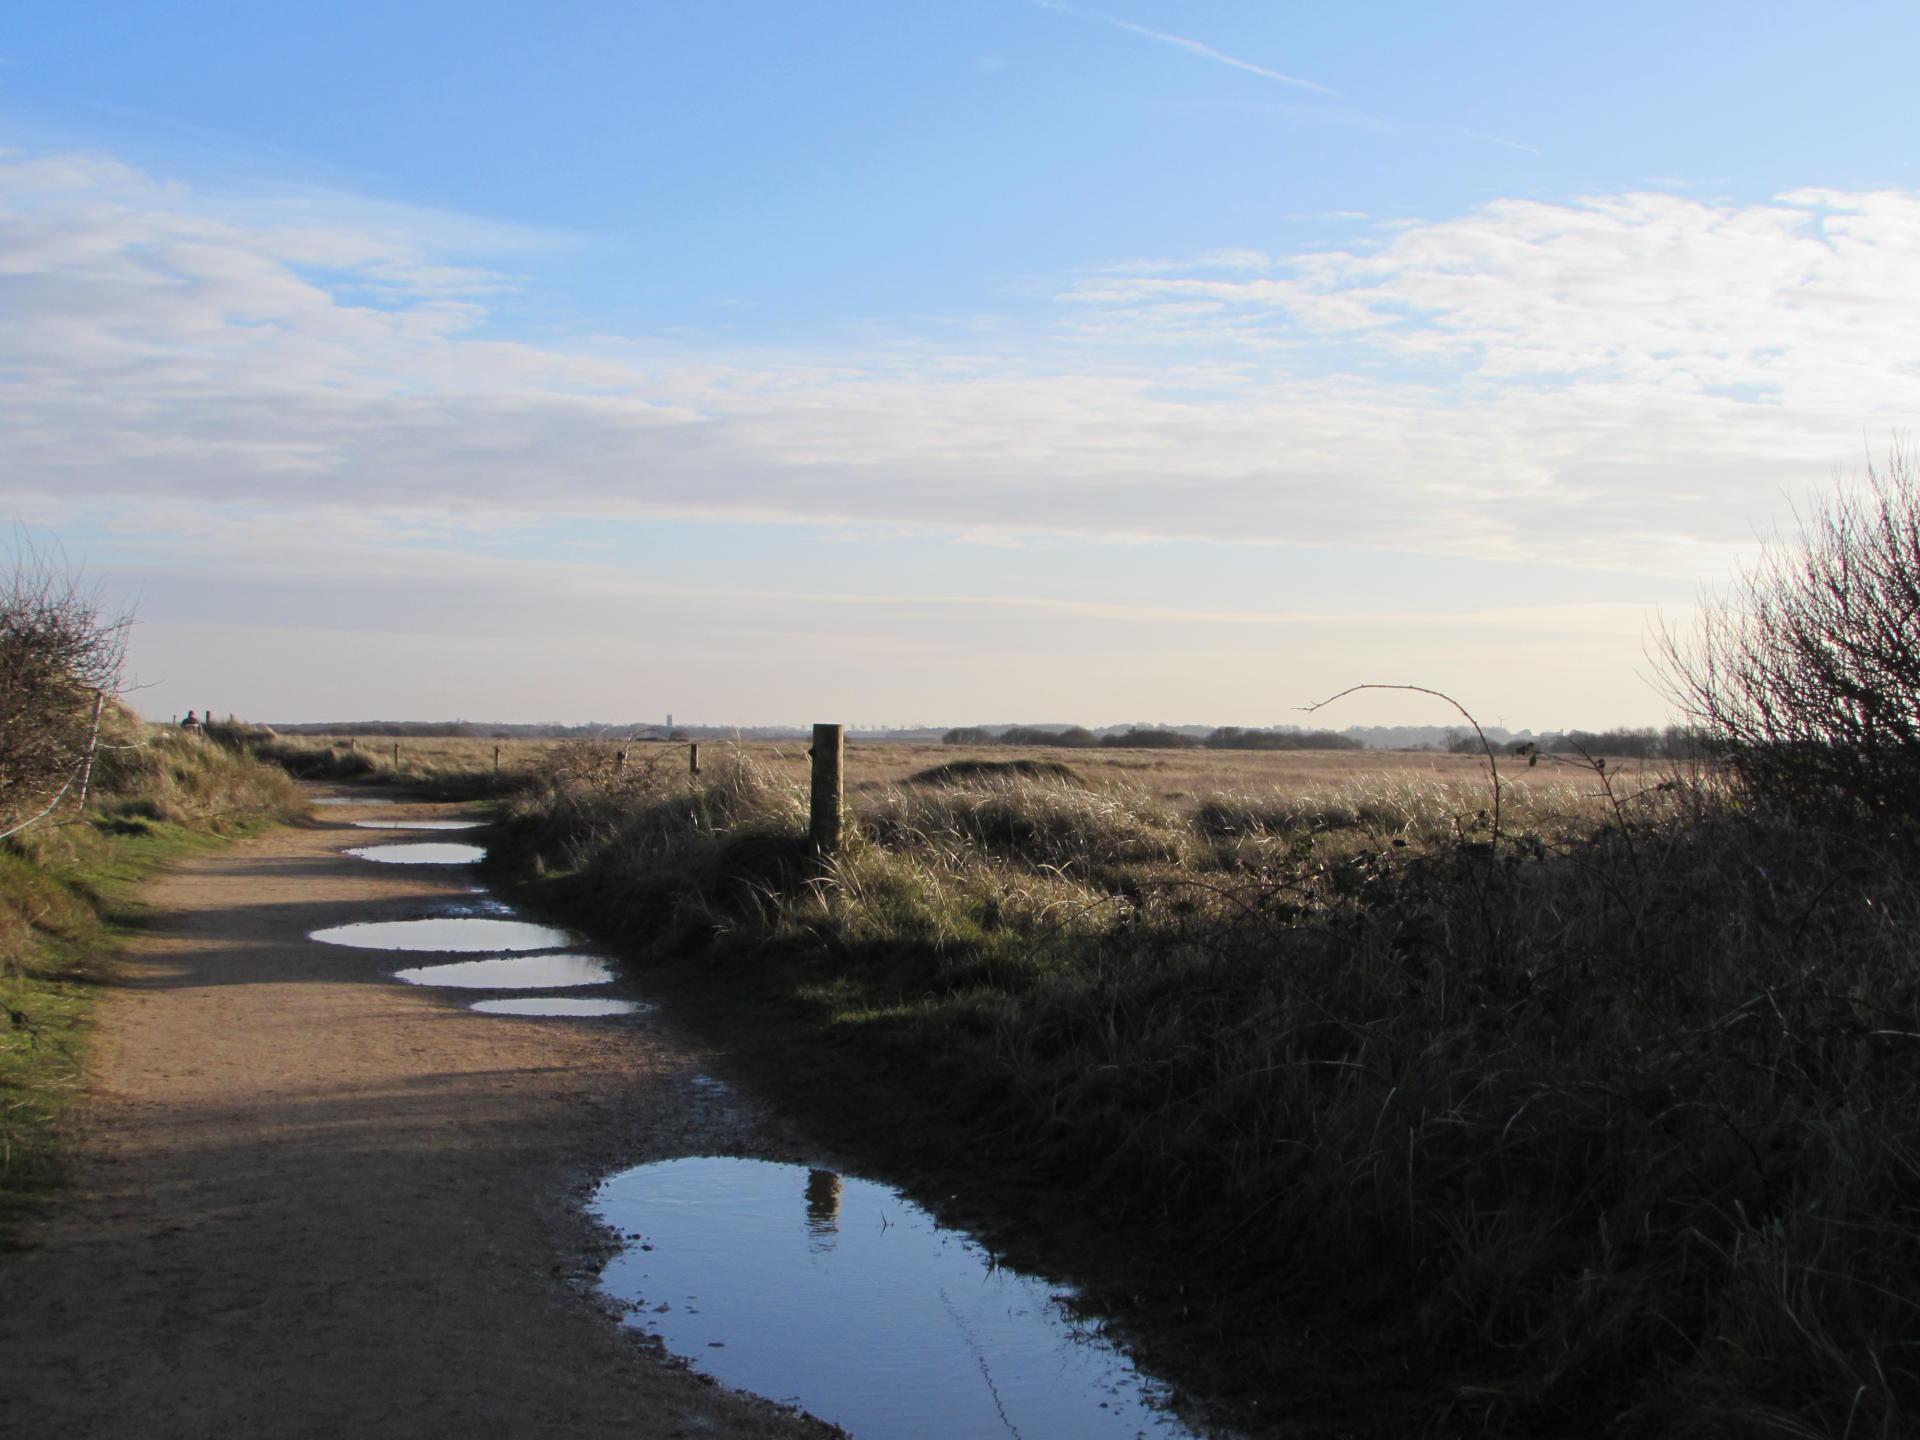 Seal Watching in North Norfolk - Yesihaveablog   Horsey Gap   Norfolk - Life in a Fine City   Winterlust